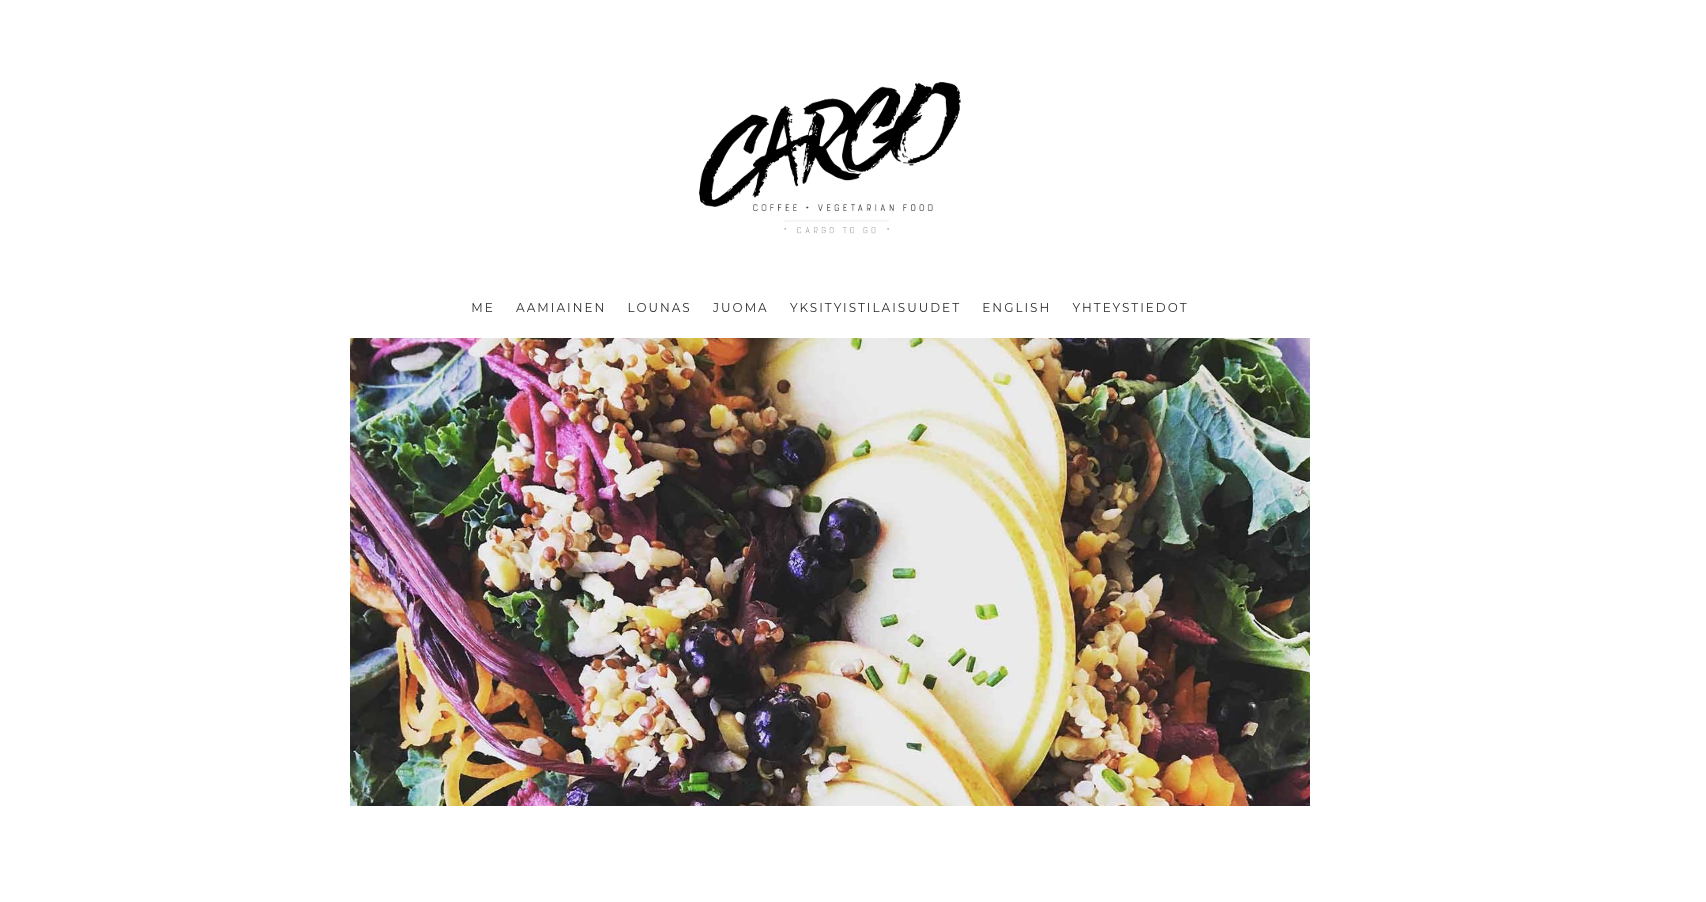 CARGO_fronts_II.png